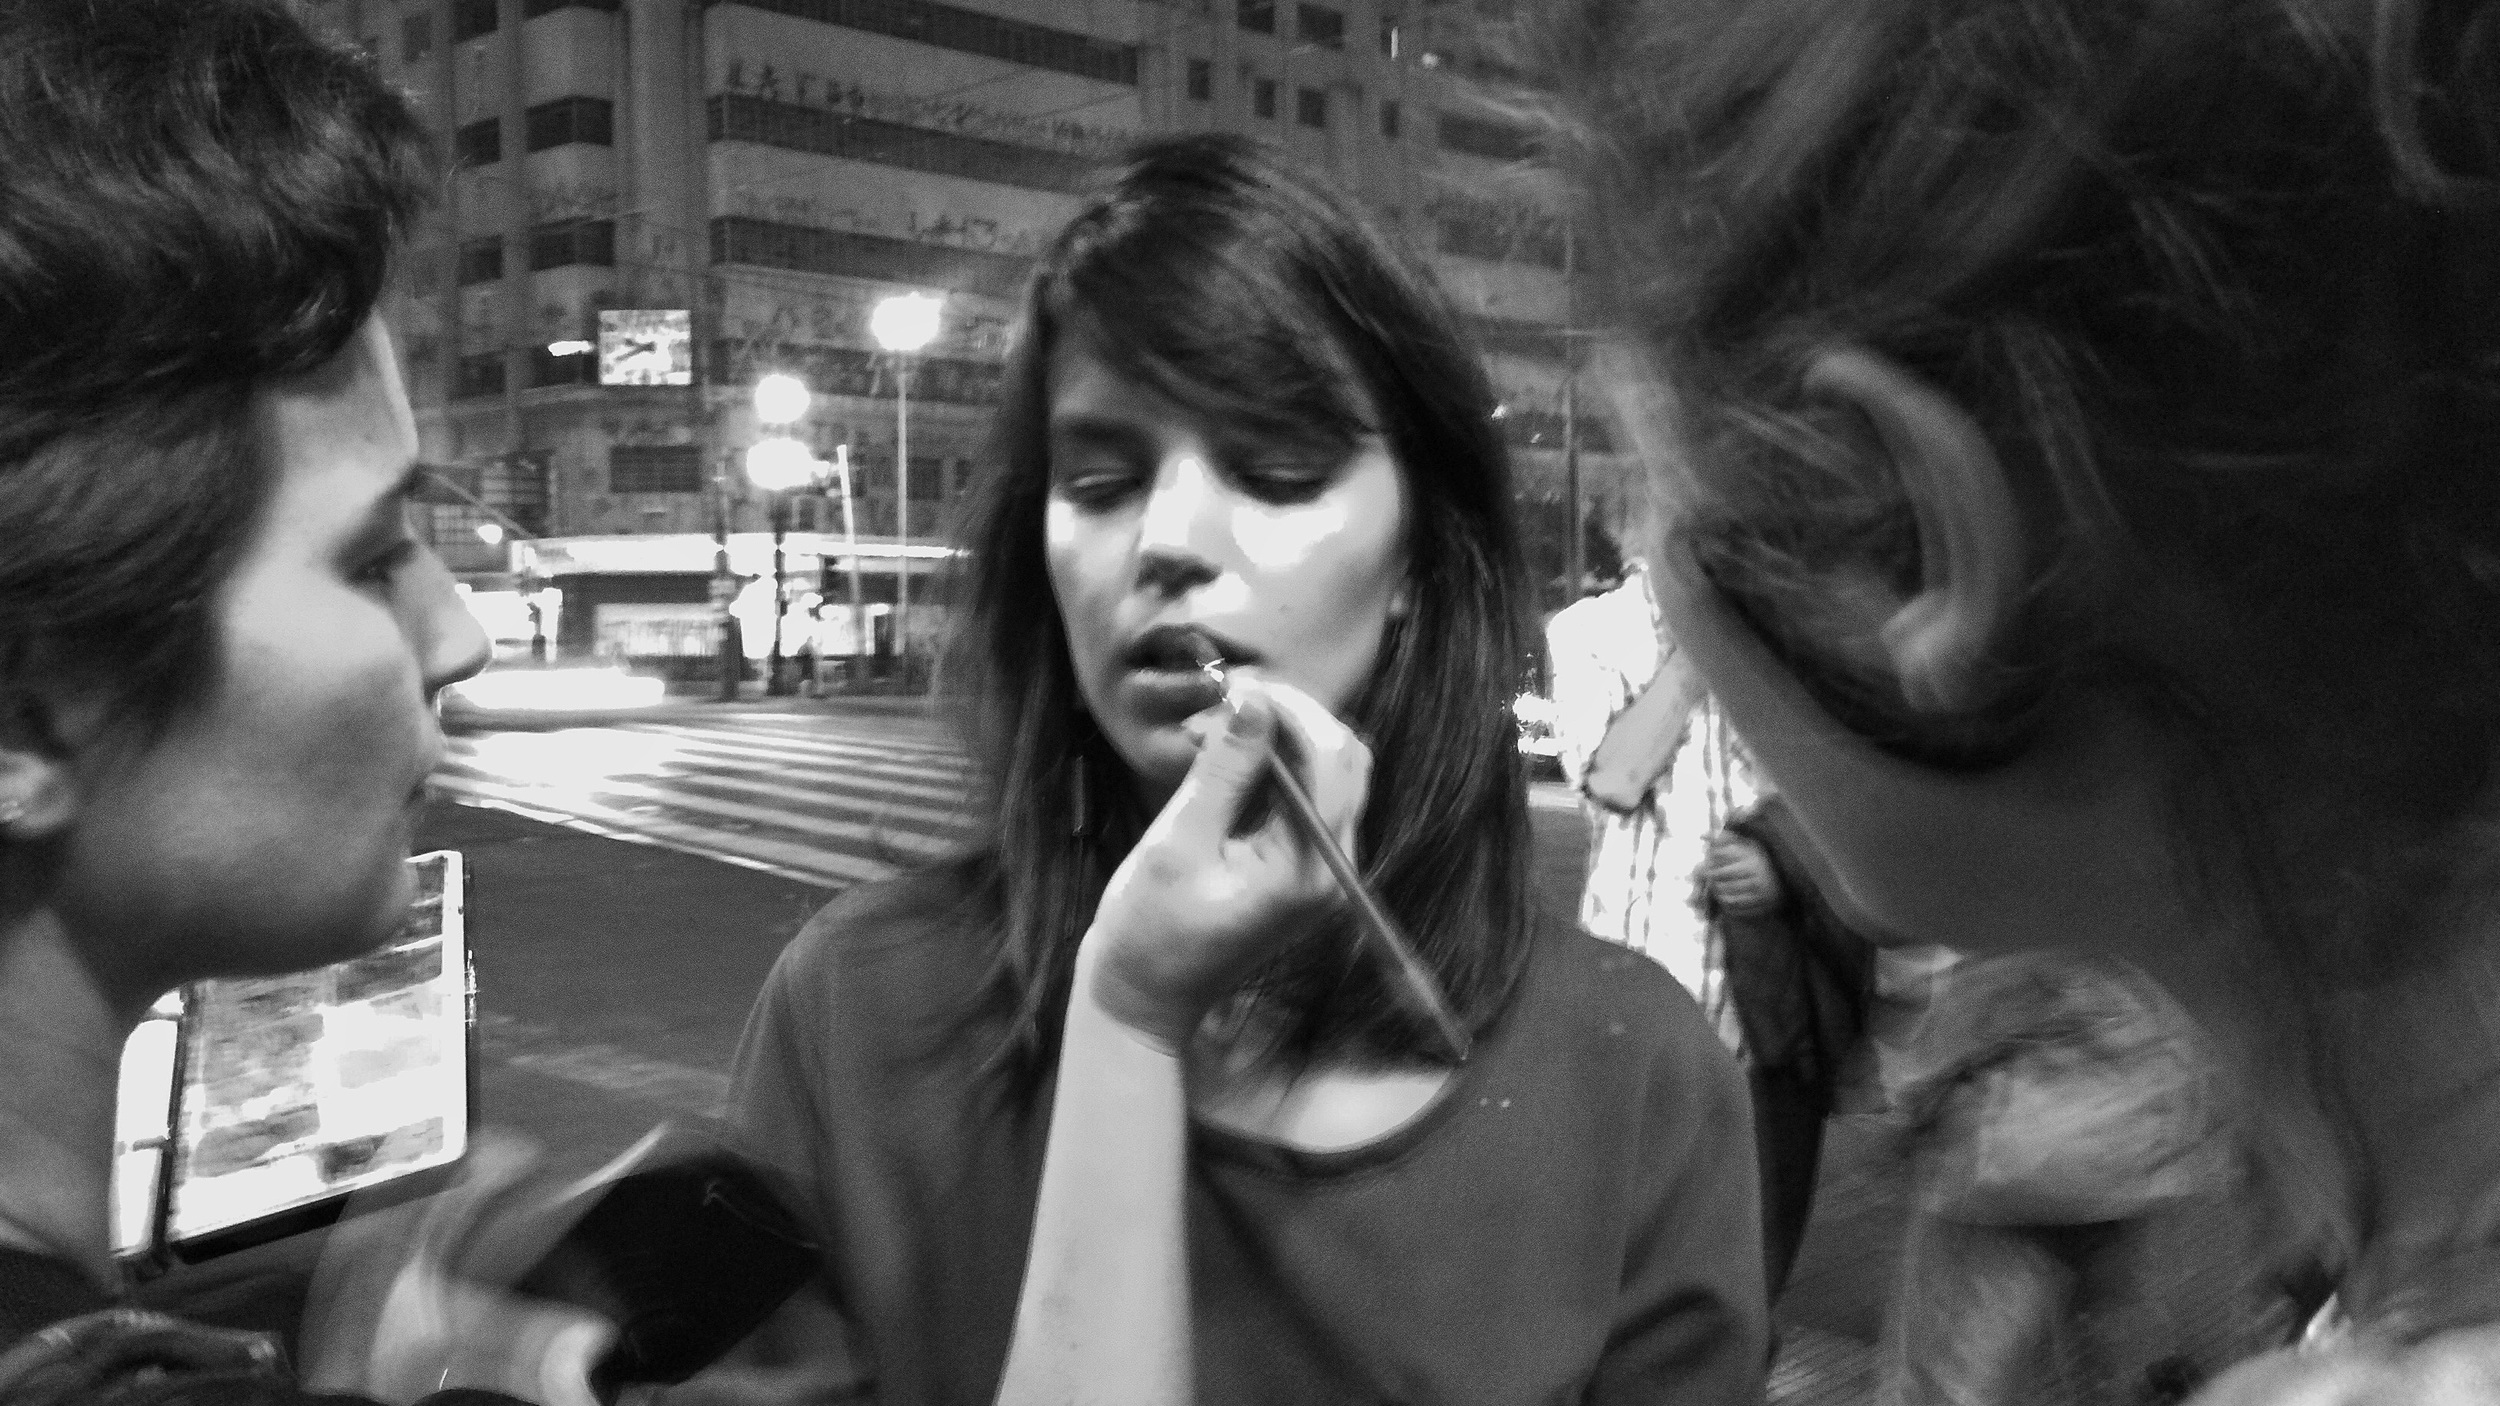 Natie Cortez + Dani Bussab + Camila Leite